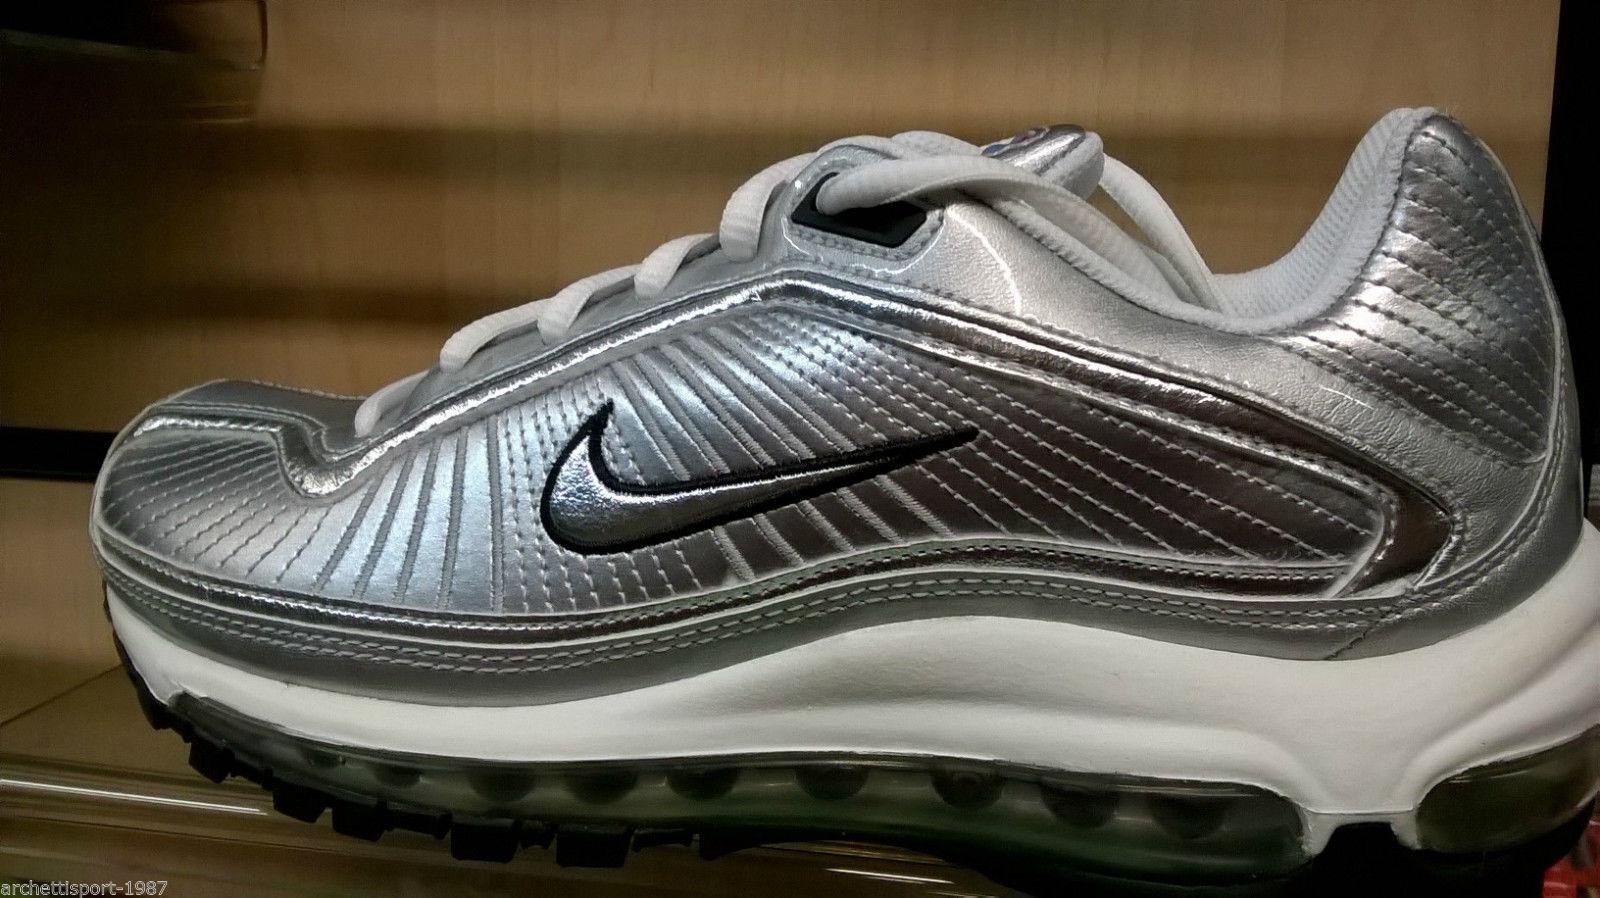 "buy online aa903 4dcfe ... Nike Cola Speed 4 Tb Zapatillas Running Hombre 833259 Zapatillas 177,.  NIKE AIR MAX MEDALLION MEDALLION MEDALLION Plata Negro Max 97 cb1503. """